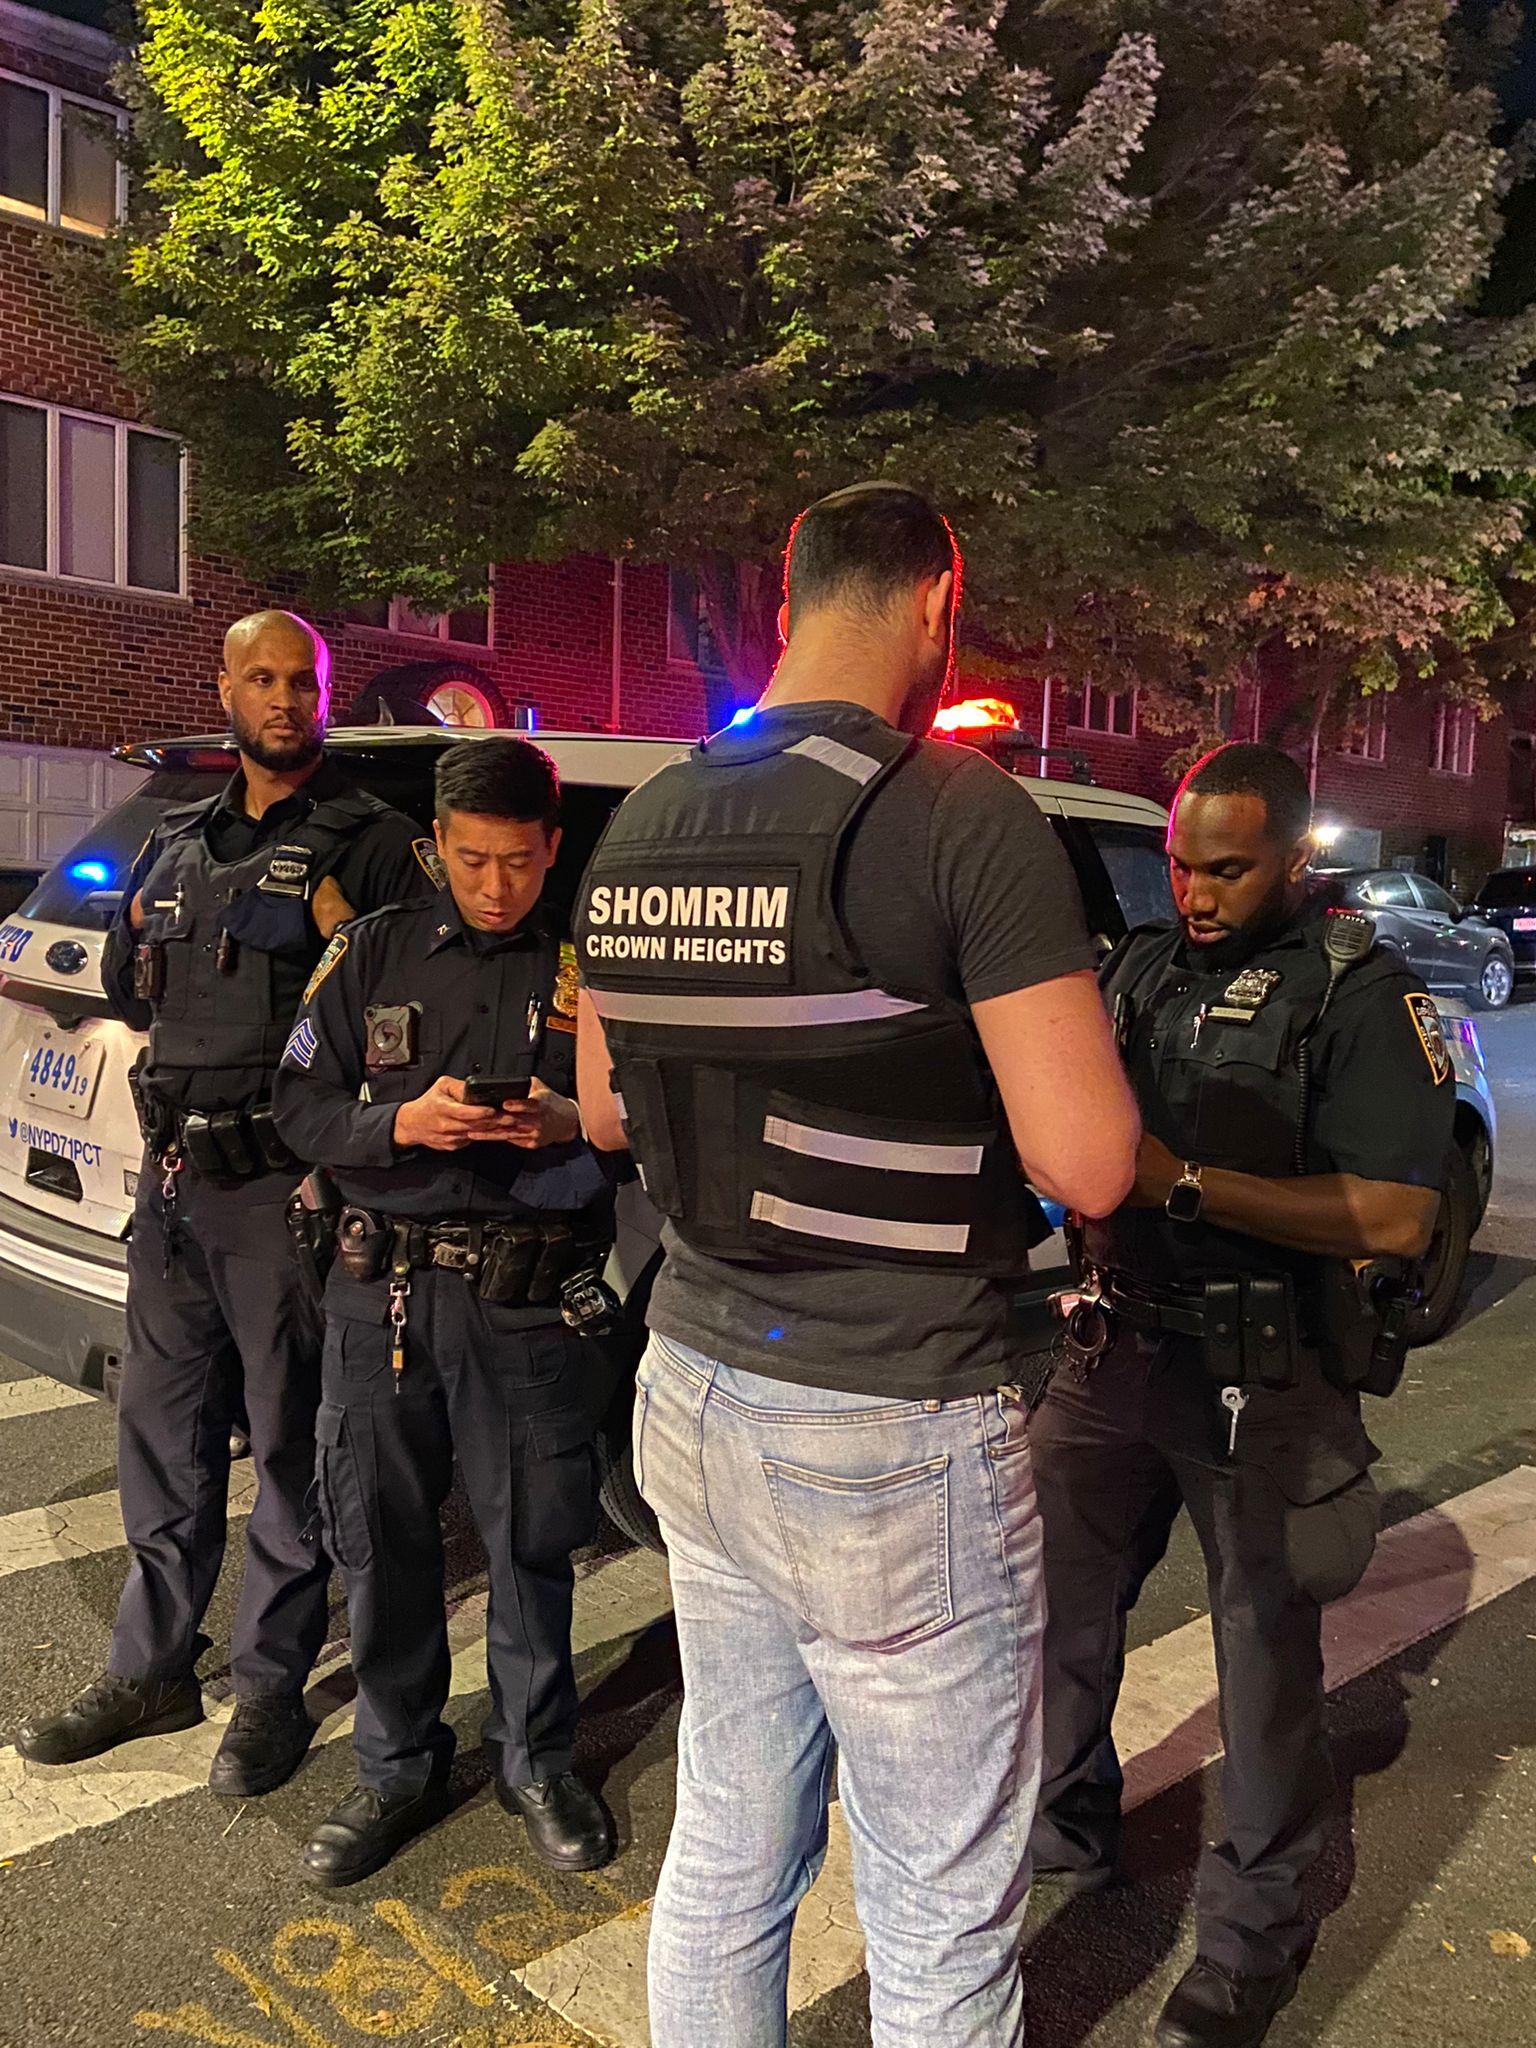 Buchur Shot With BB Gun At Crown Heights